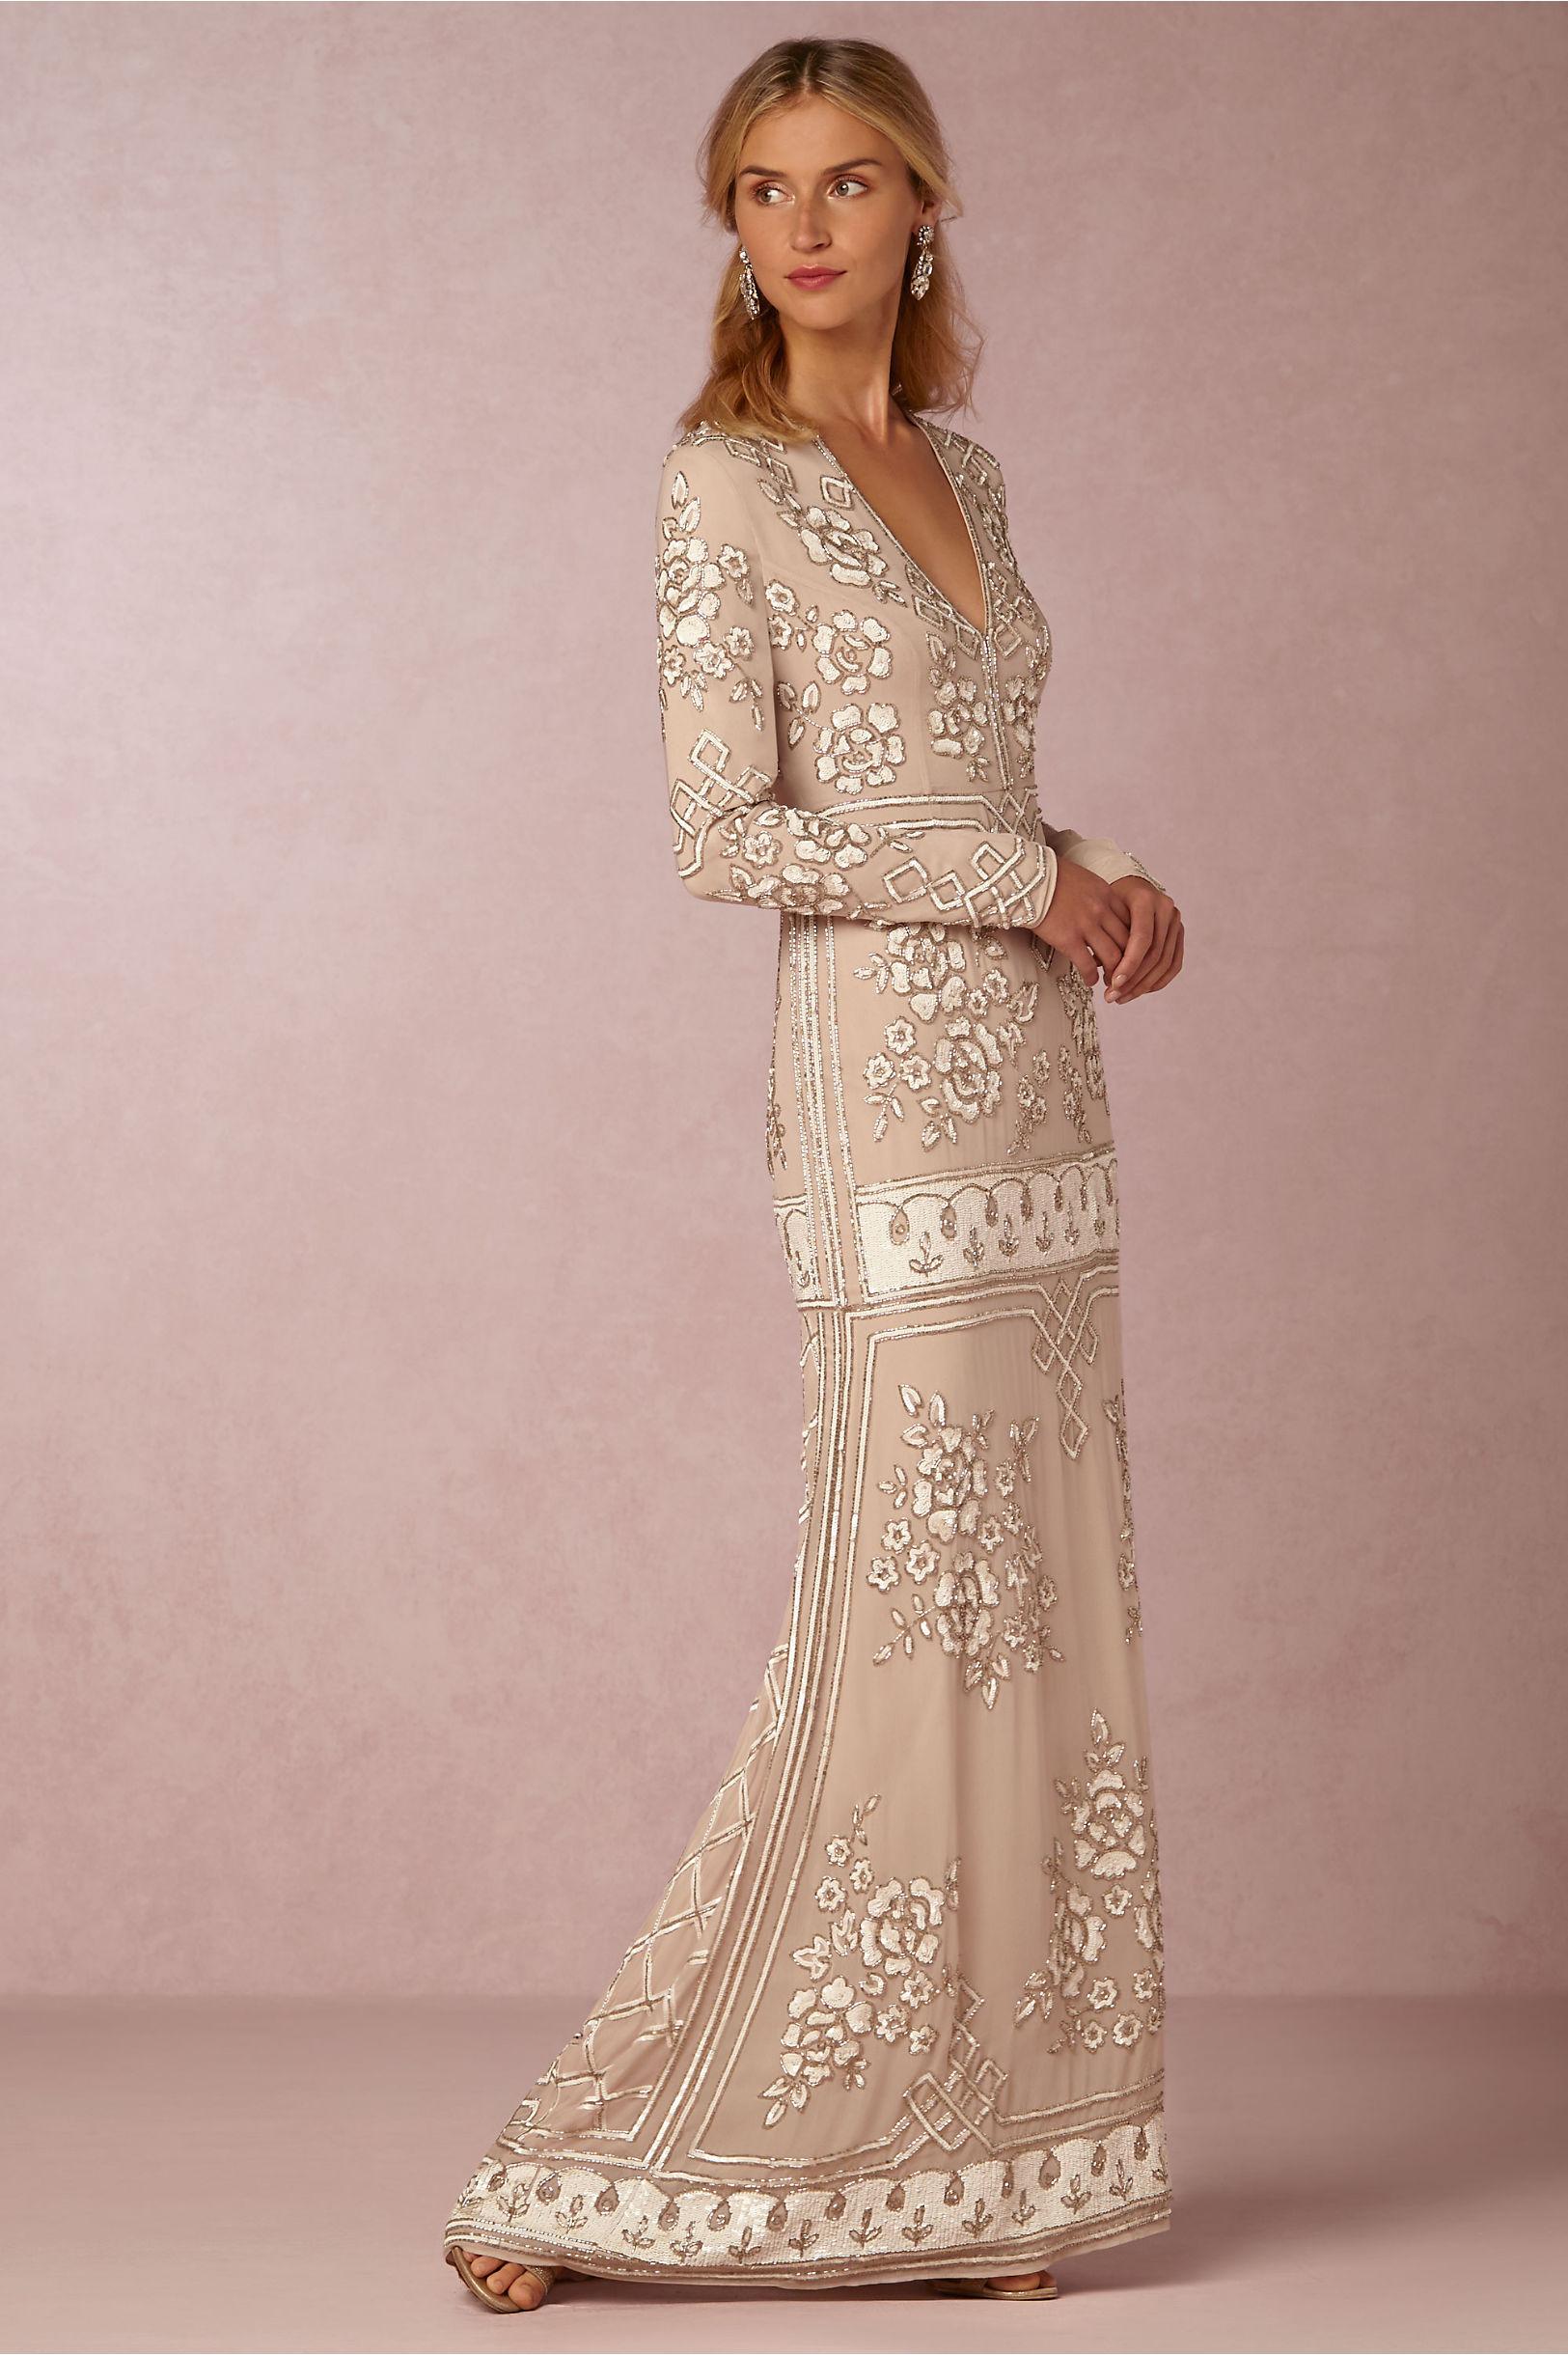 Lake Gown in Sale Wedding Dresses | BHLDN